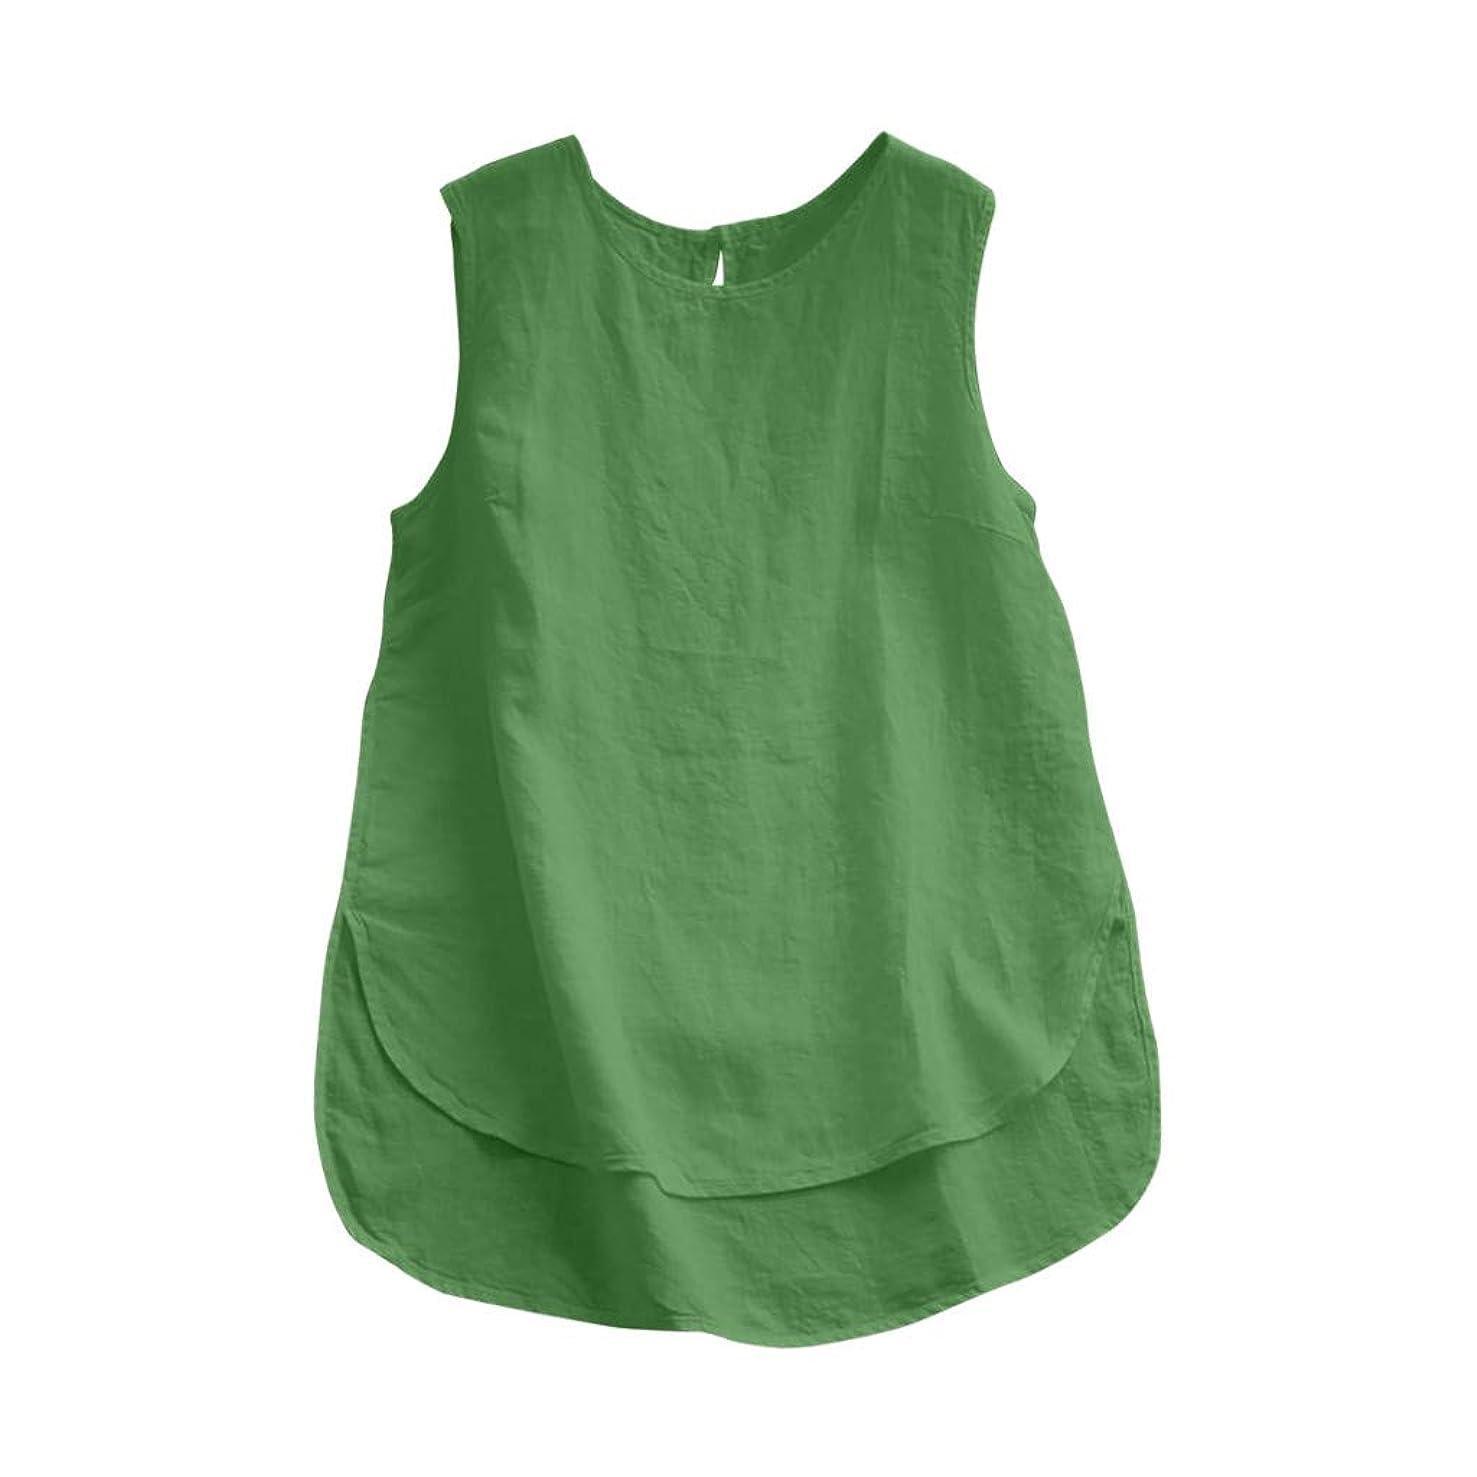 Sunyastor Cotton Linen Tank Tops for Women Sleeveless Plus Size Casual Loose Vintage Solid Vest Blouse